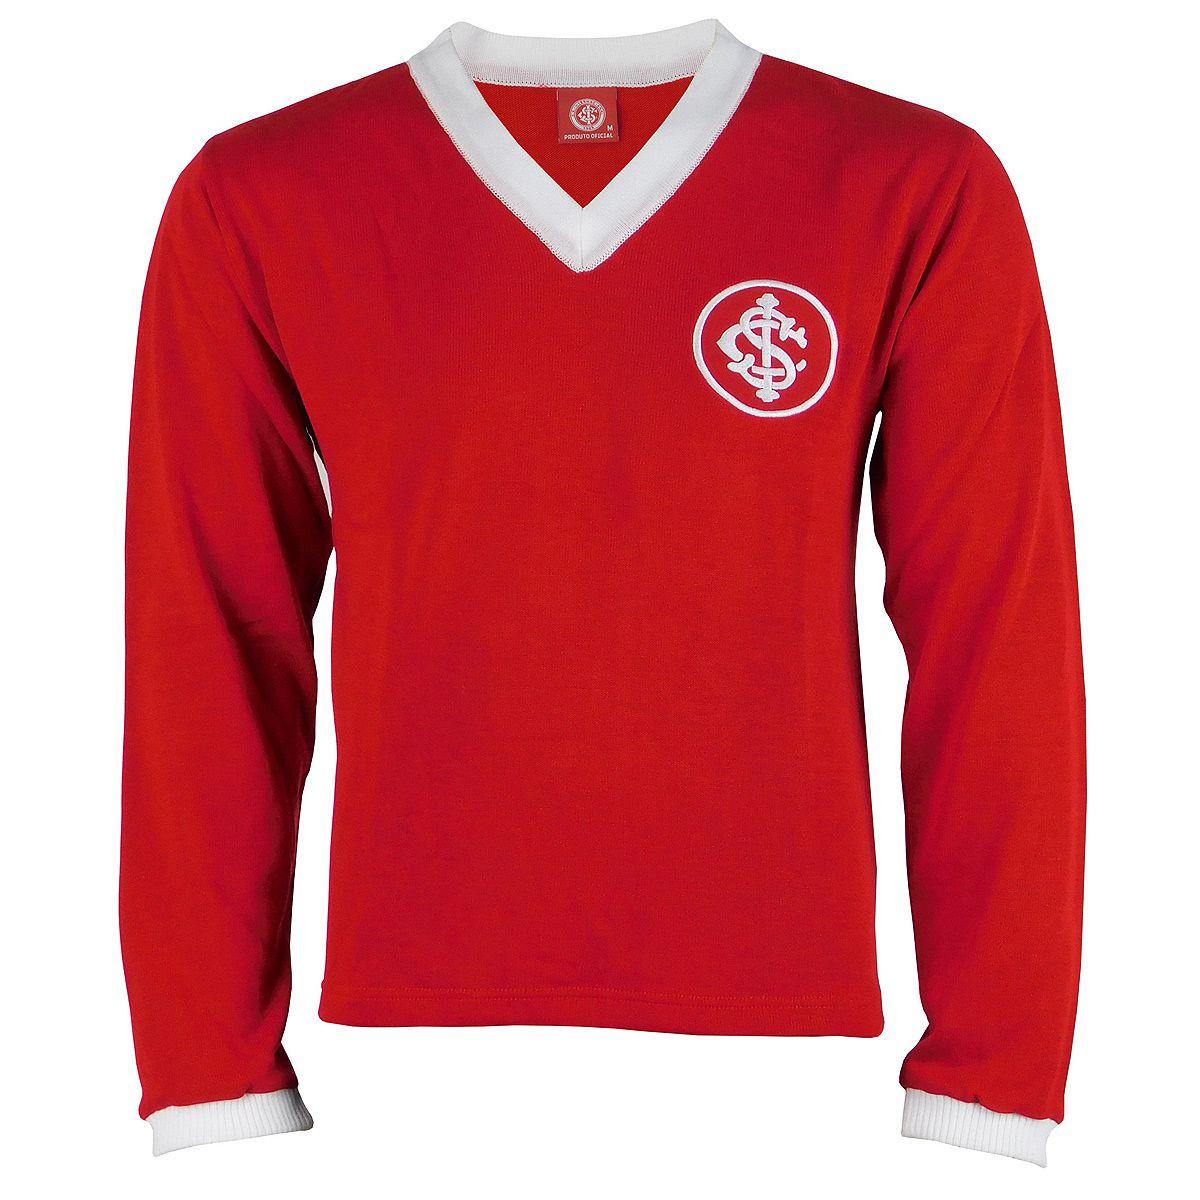 Camisa Internacional Retrô 1975 Figueroa Tricô Manga Longa